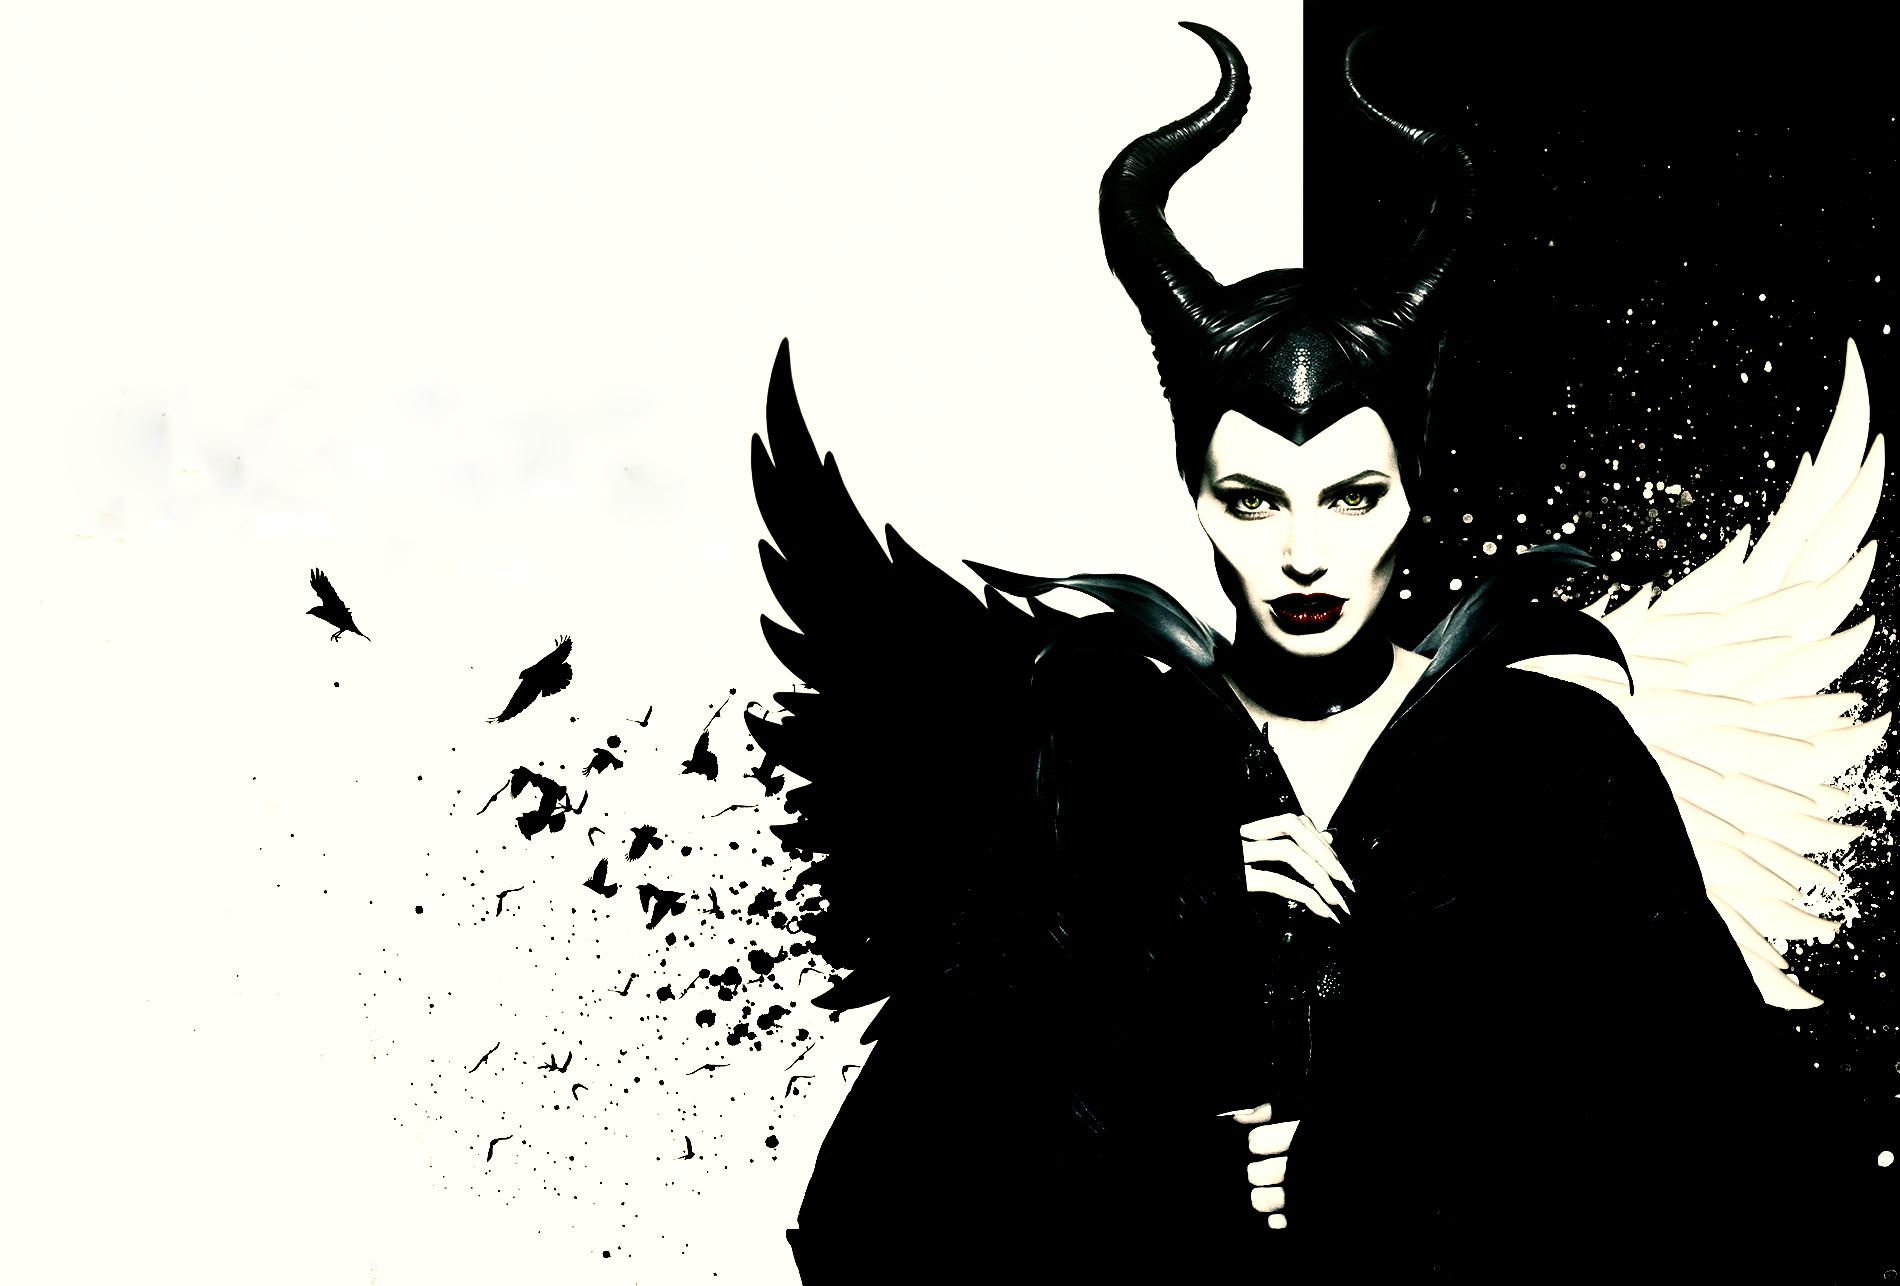 Walt disney fondo de pantalla - Maleficent